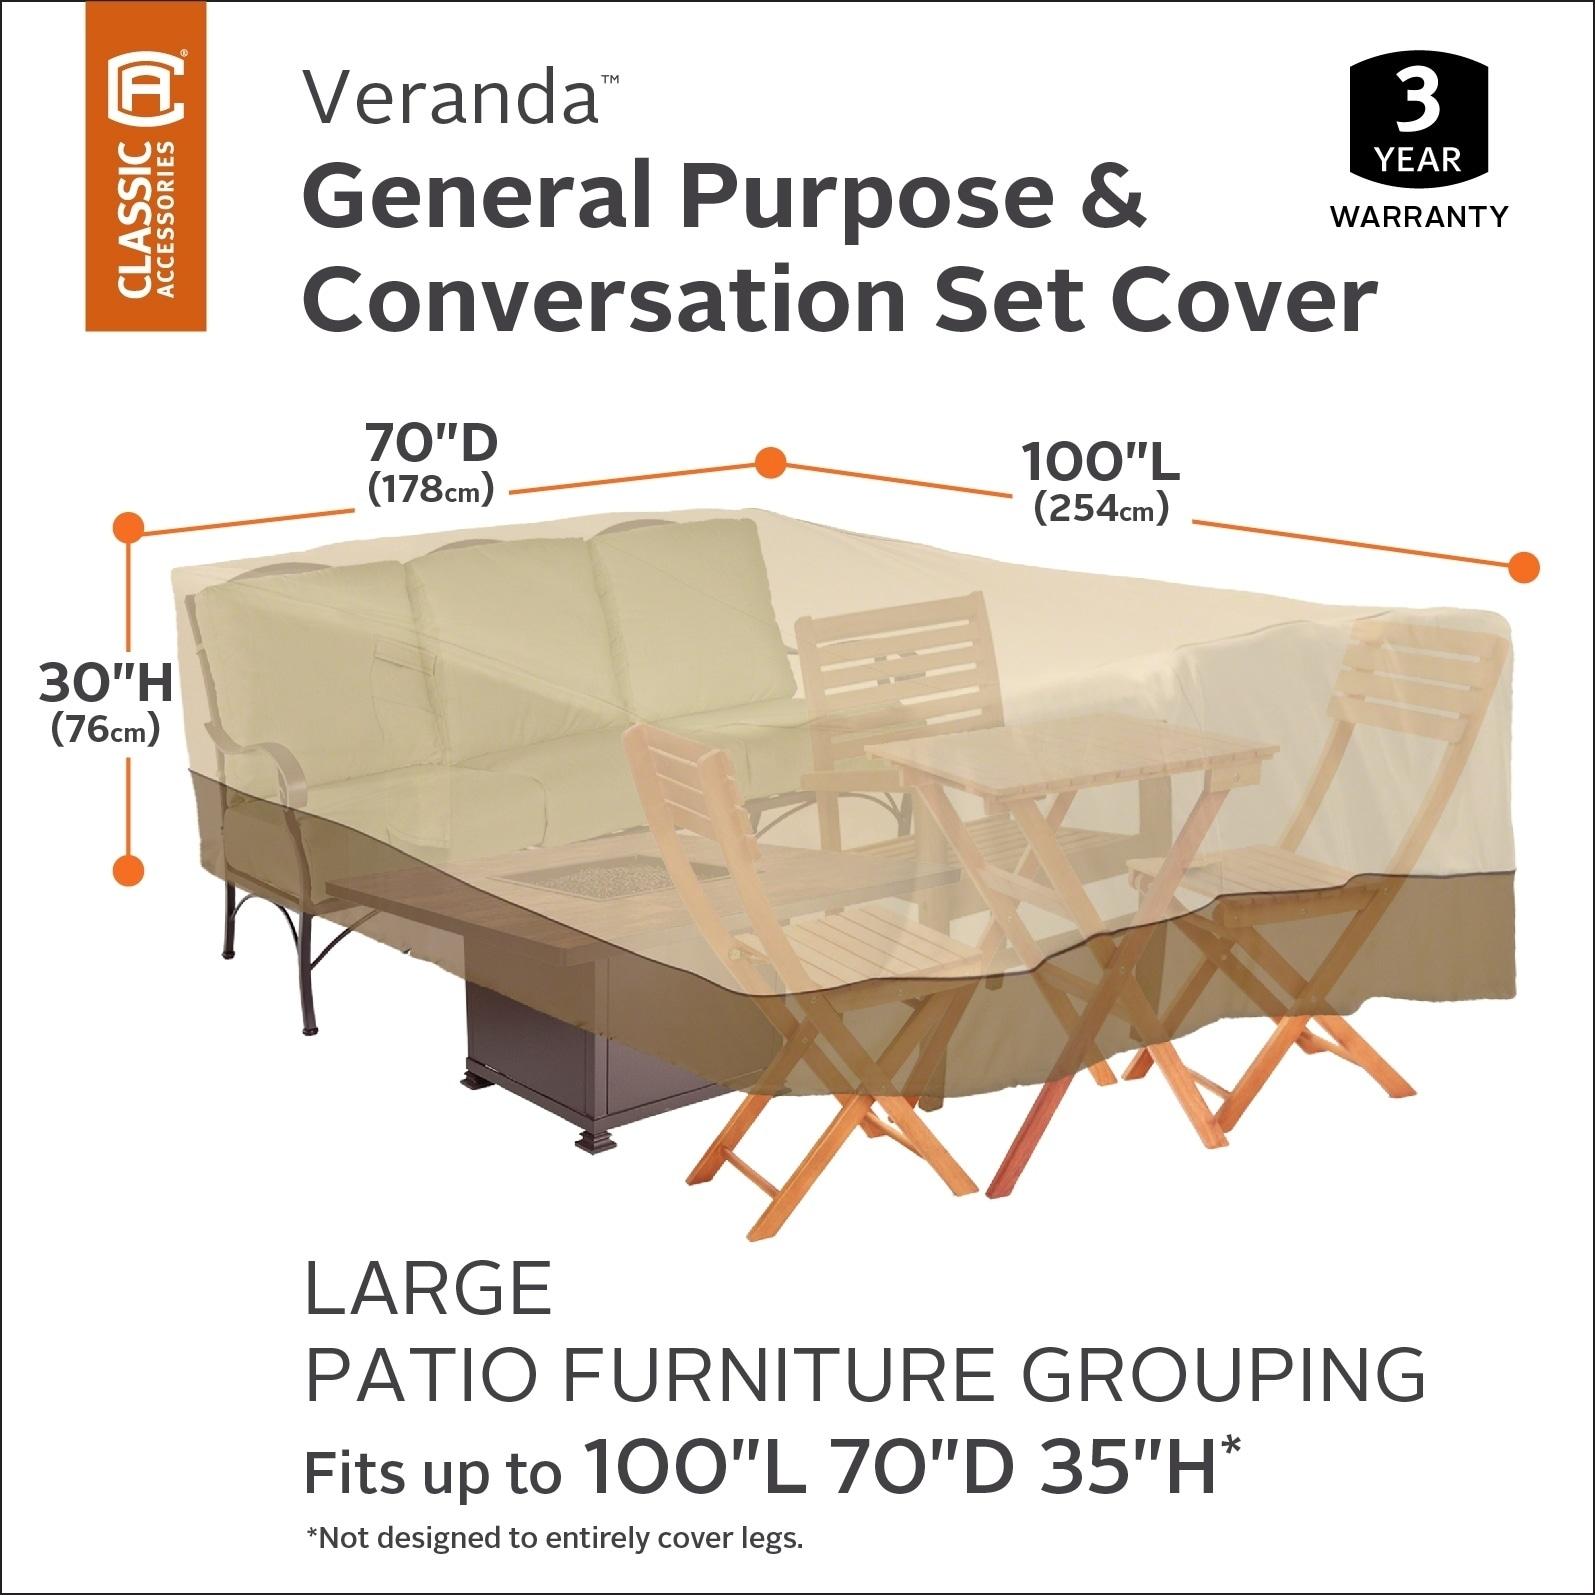 Clic Accessories Veranda Conversation Set General Purpose Patio Furniture Cover Large Free Shipping Today 18612052